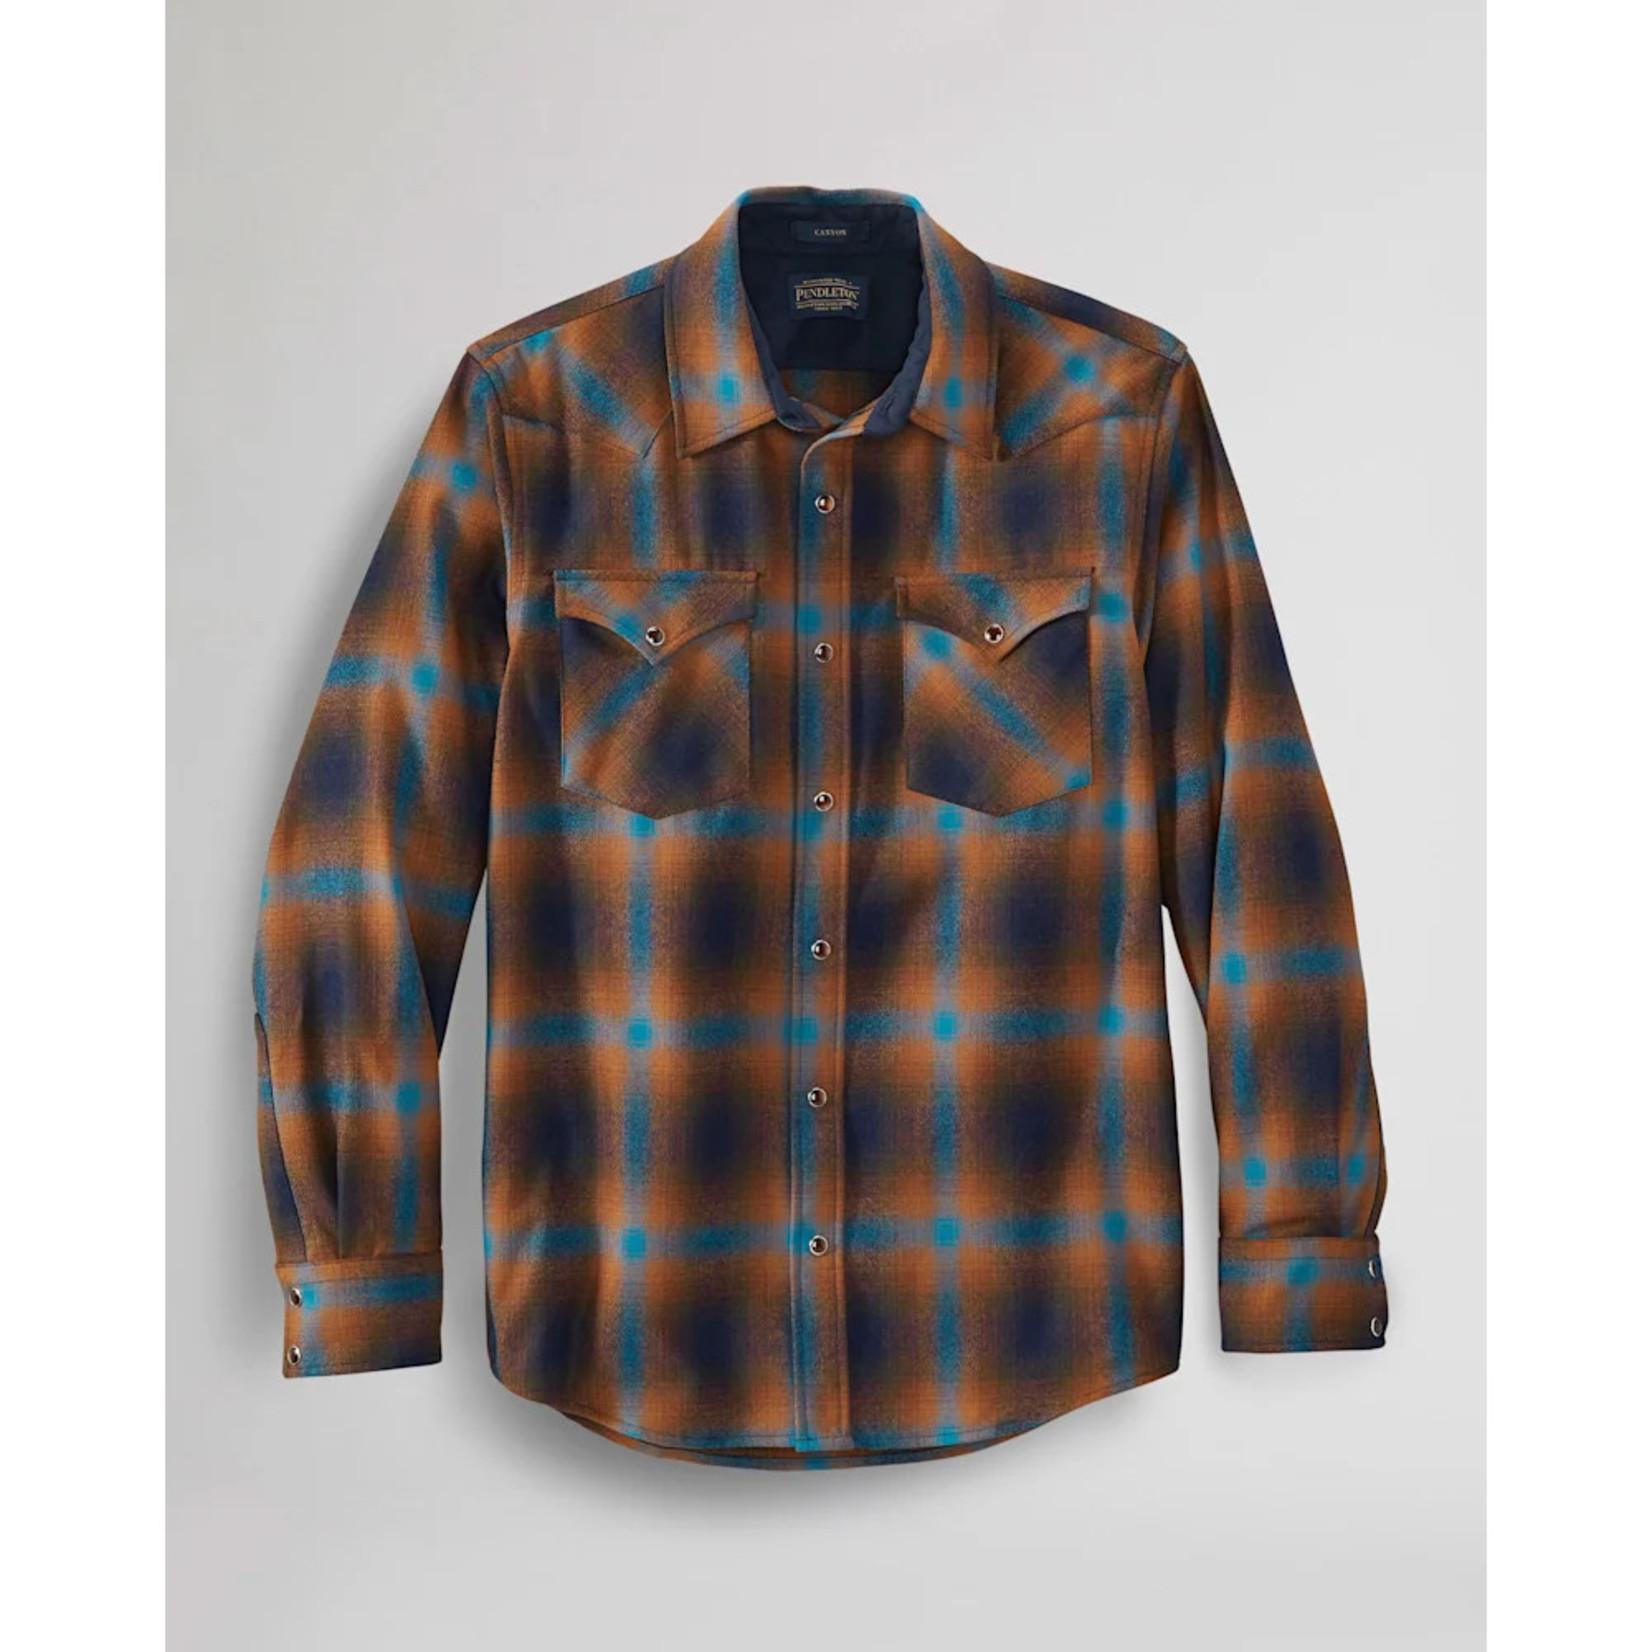 Pendleton Pendleton Canyon Shirt RA642-32411